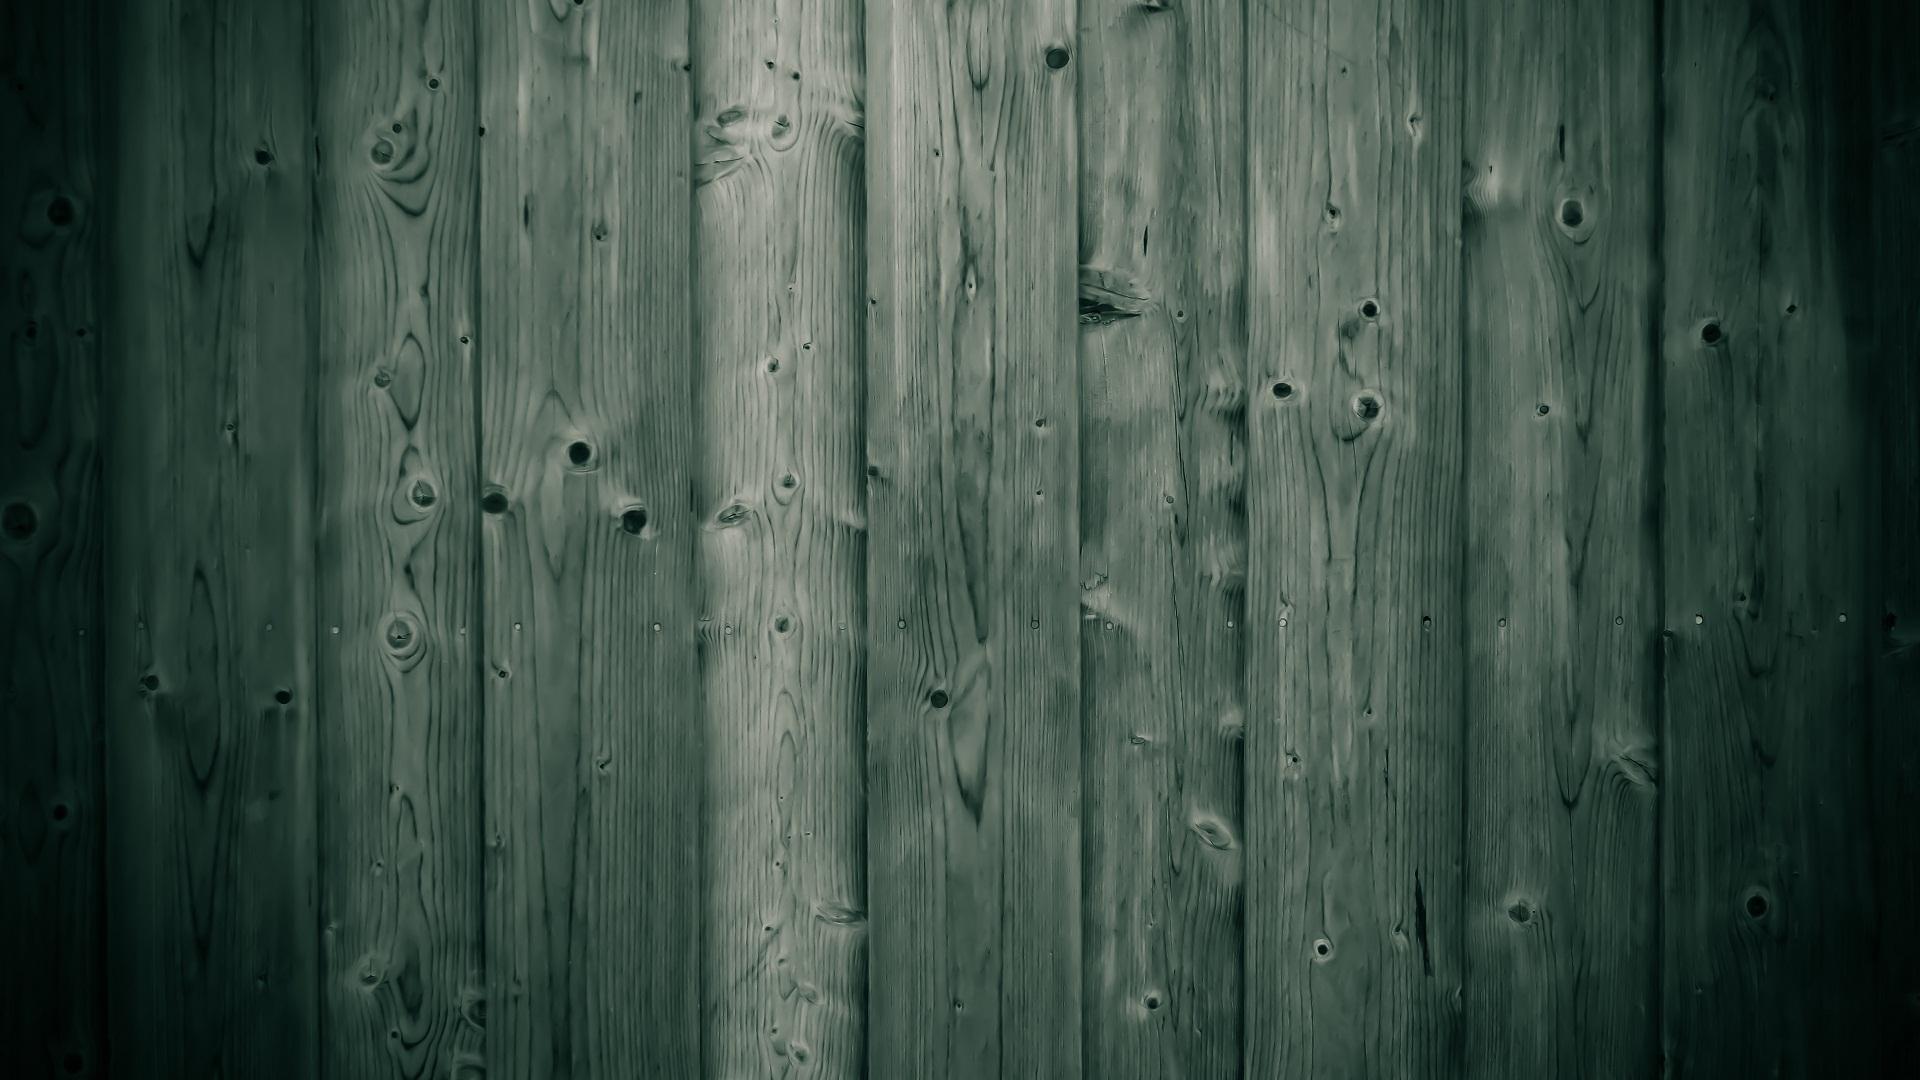 Download wallpaper 1920x1080 wooden background texture for Sfondo legno hd